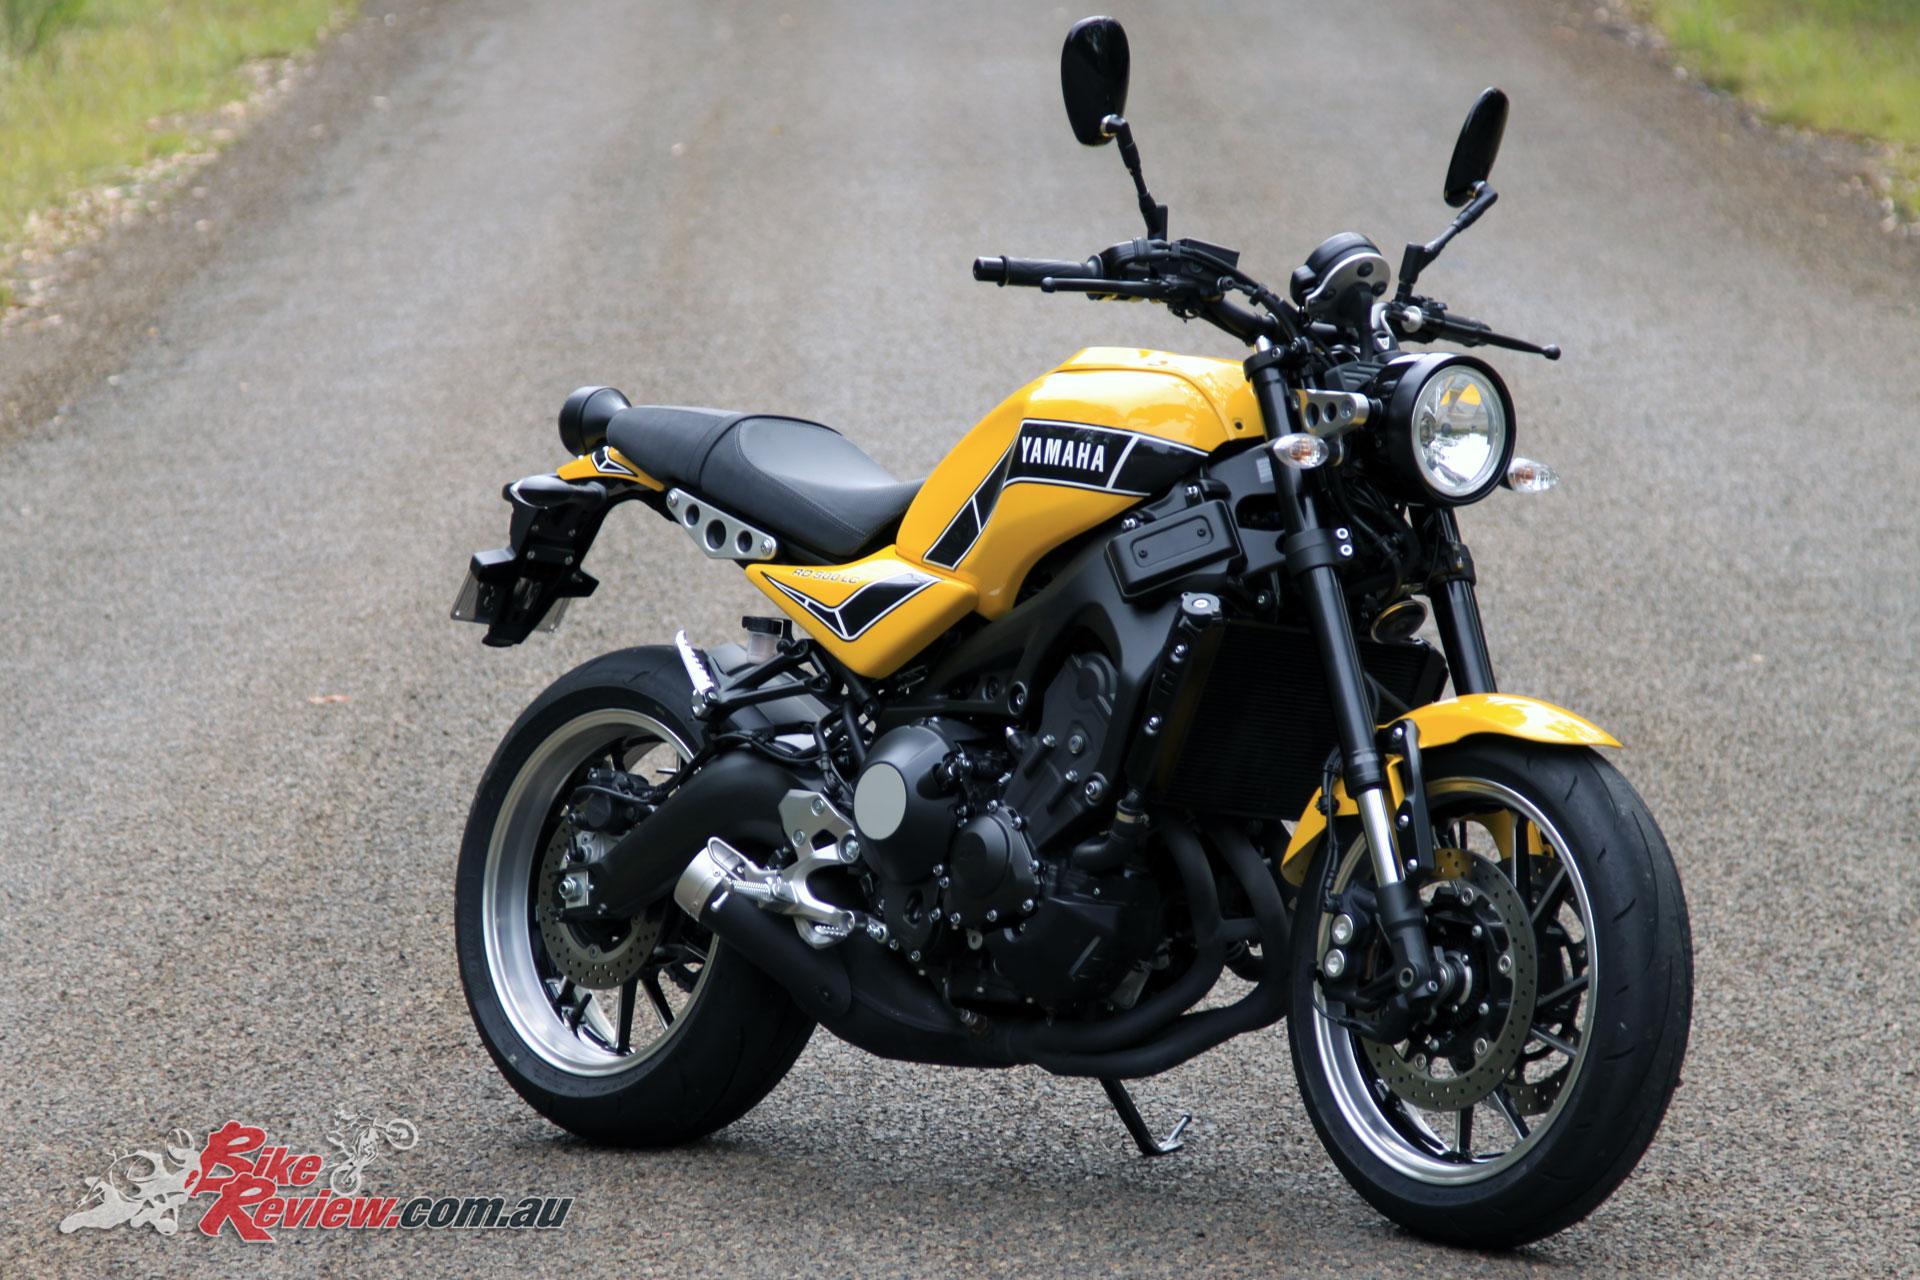 Yamaha XSR900 'Kenny Roberts RD900LC'